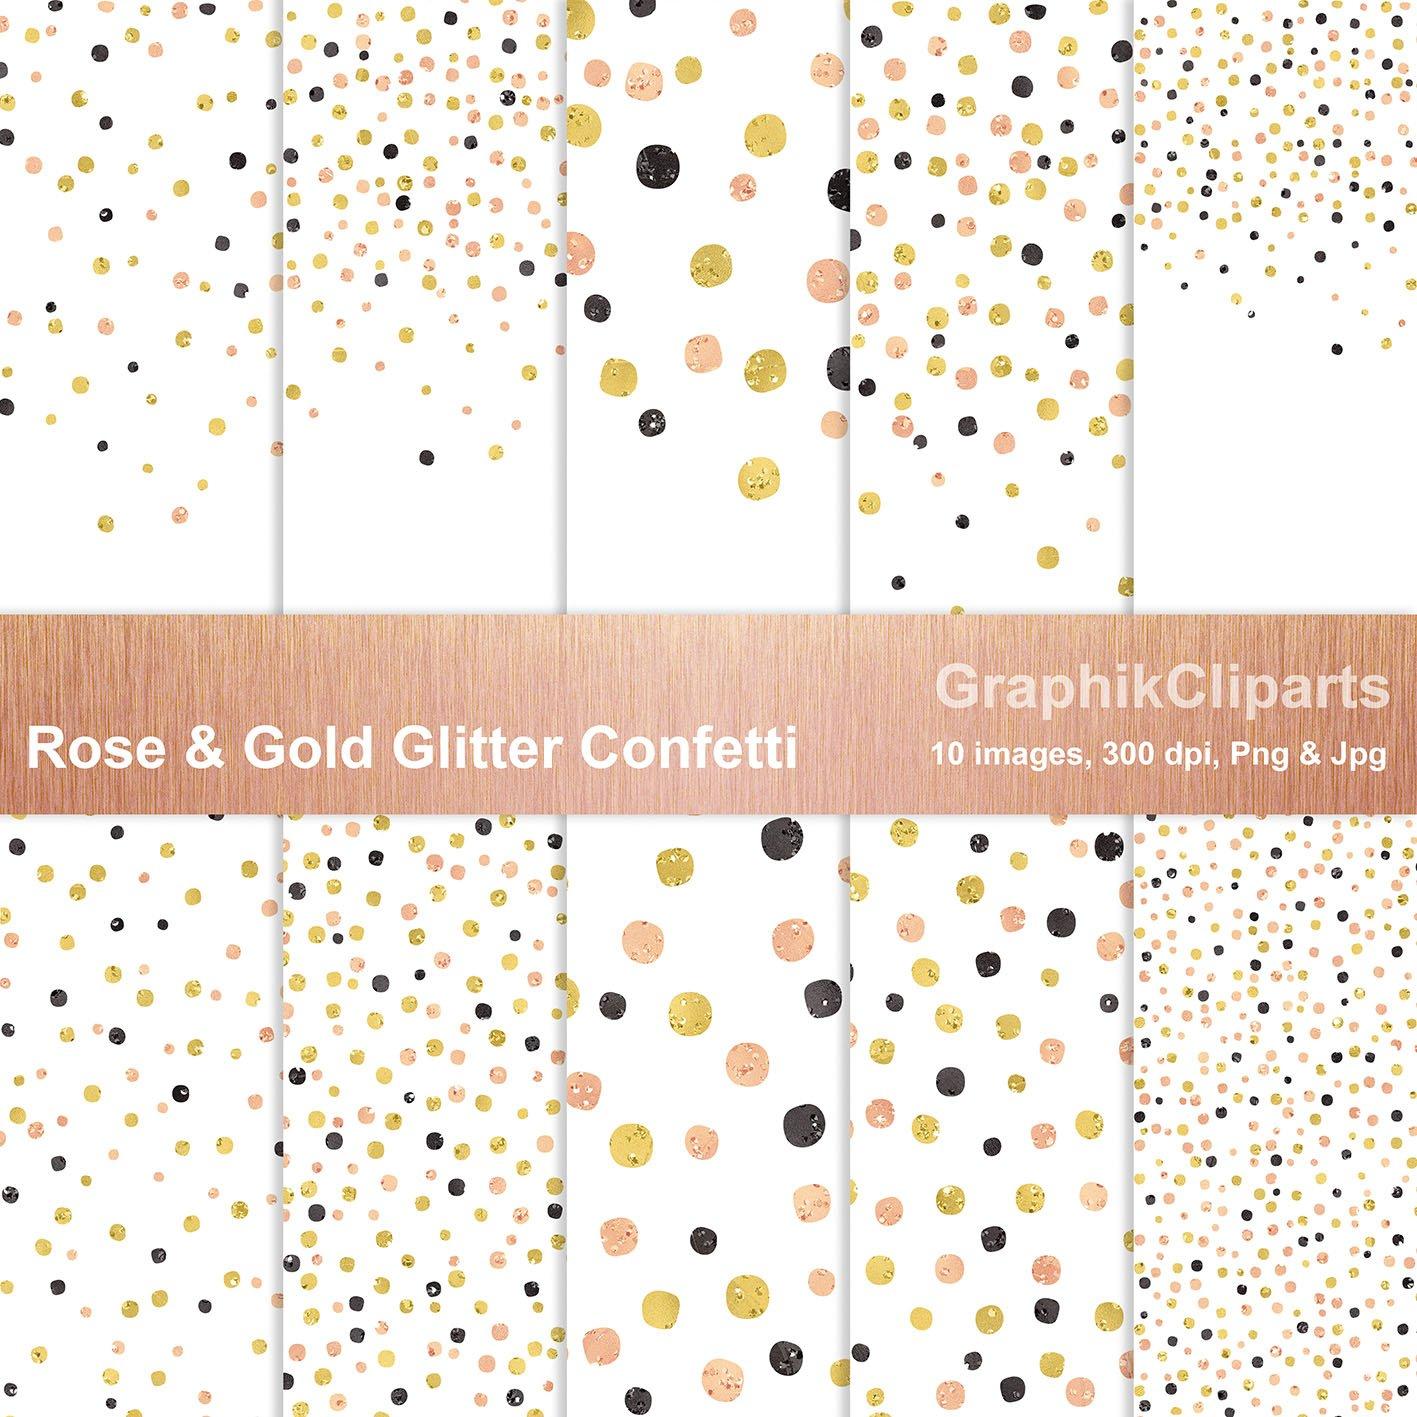 Rose Gold Glitter Confetti Png Jpg Graphic Patterns Creative Market